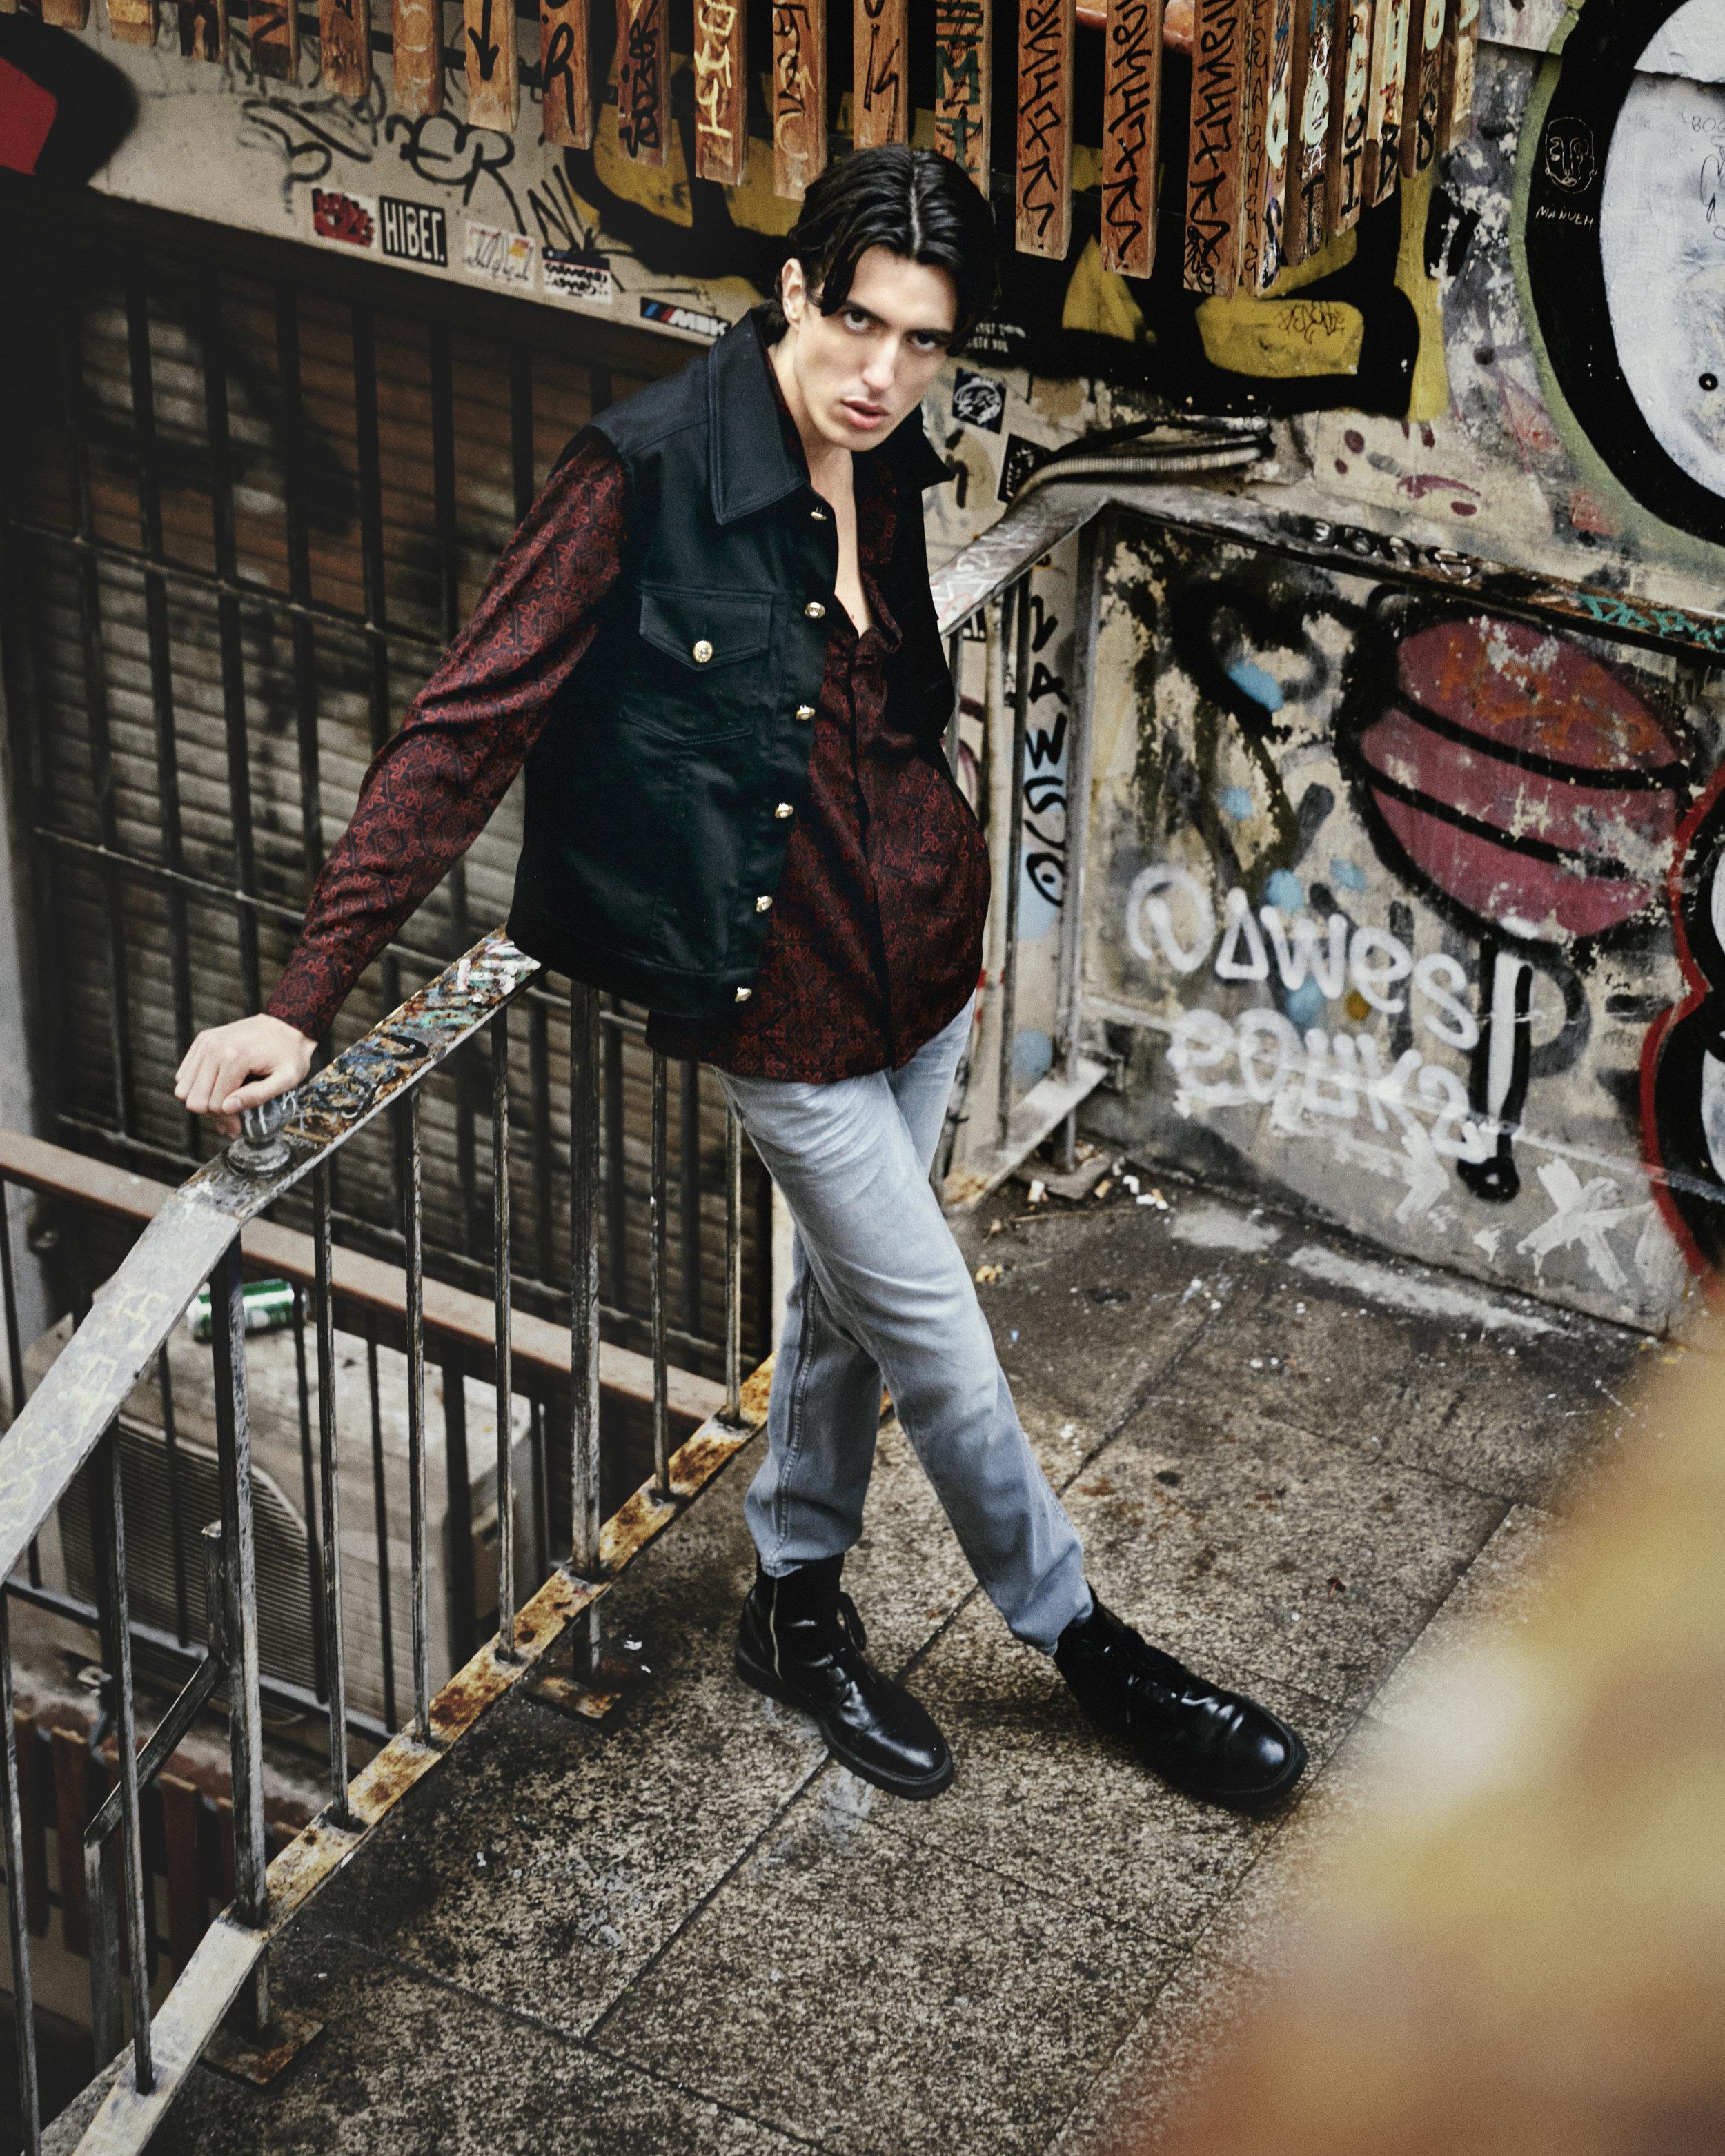 Earring- SANTAVANITAS  Shirt – LOS PECOS MUTANTES  Chaleco – MAN'S CONCEPT  Jeans – KIABI  Boots – ZARA